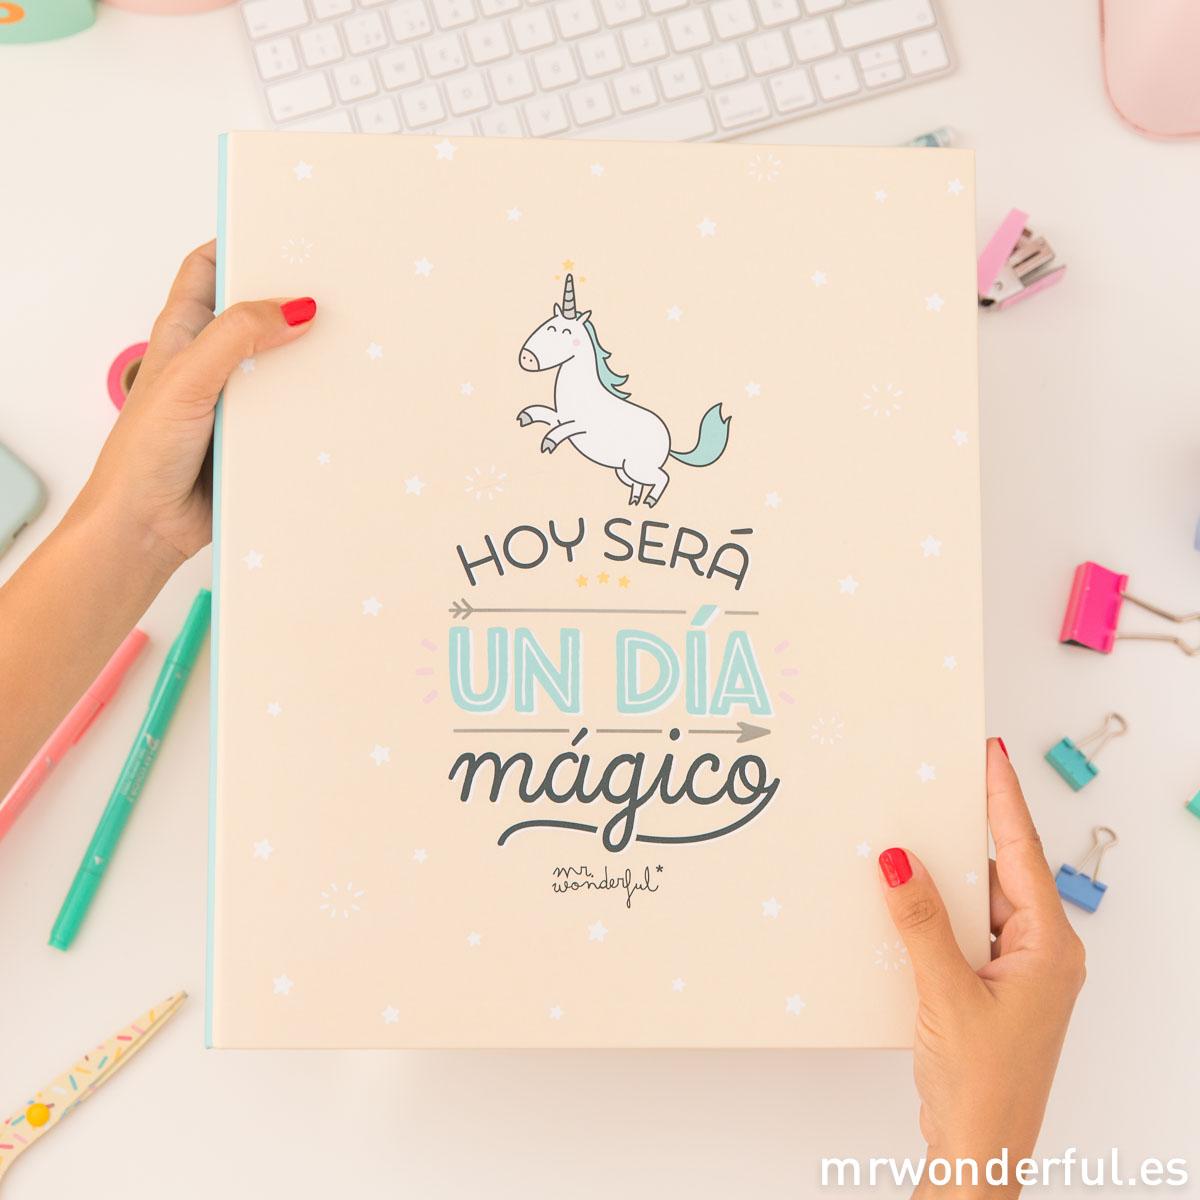 mrwonderful_8435460707275_WOA03706ES_clasificador_hoy-sera-un-dia-magico_CAST-3-Editar